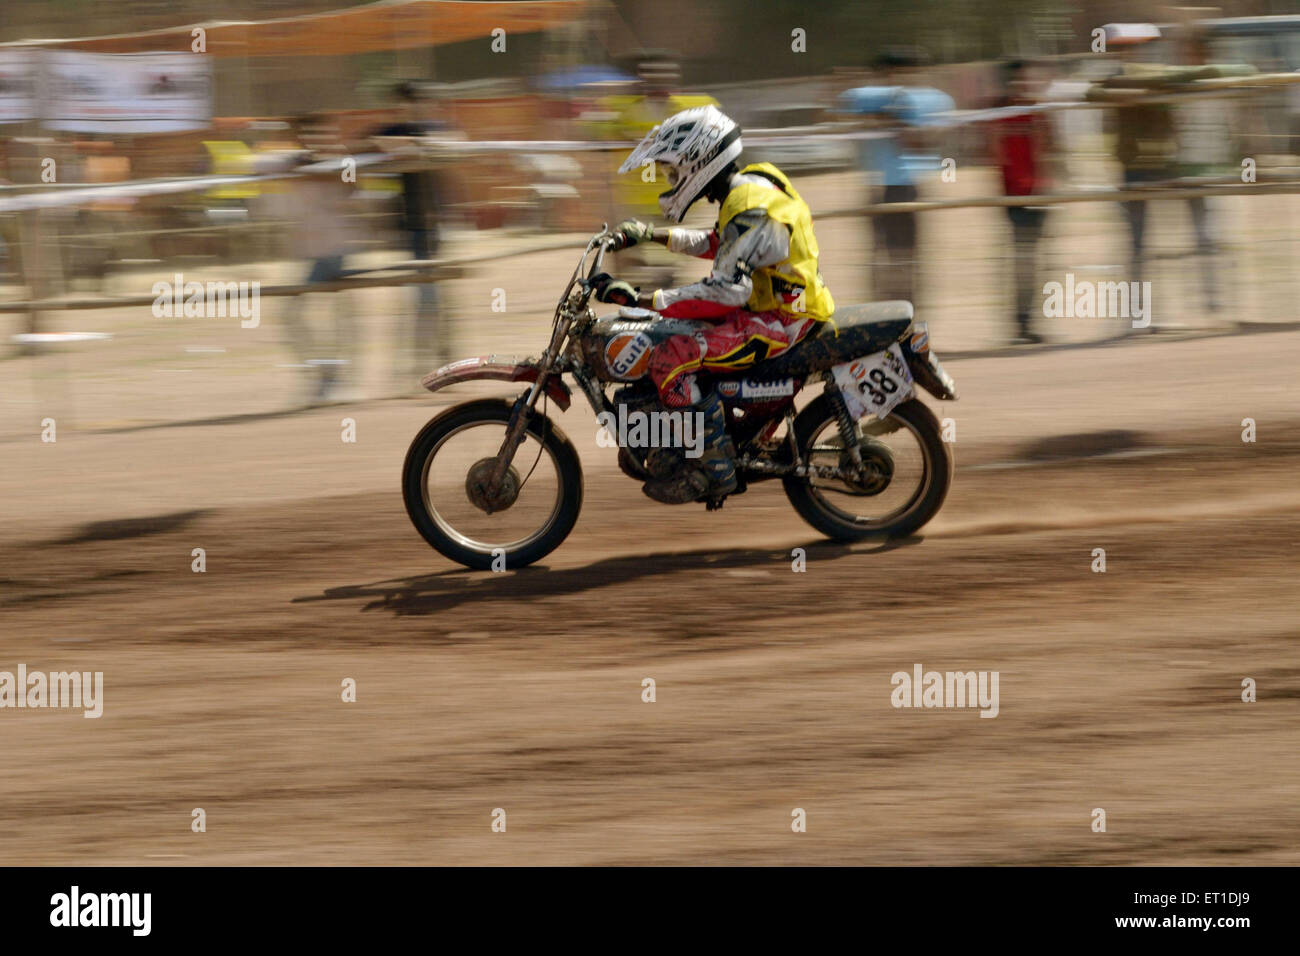 Bike racer in Gulf Dirt national bike race Jodhpur Rajasthan India Asia 2011 - Stock Image